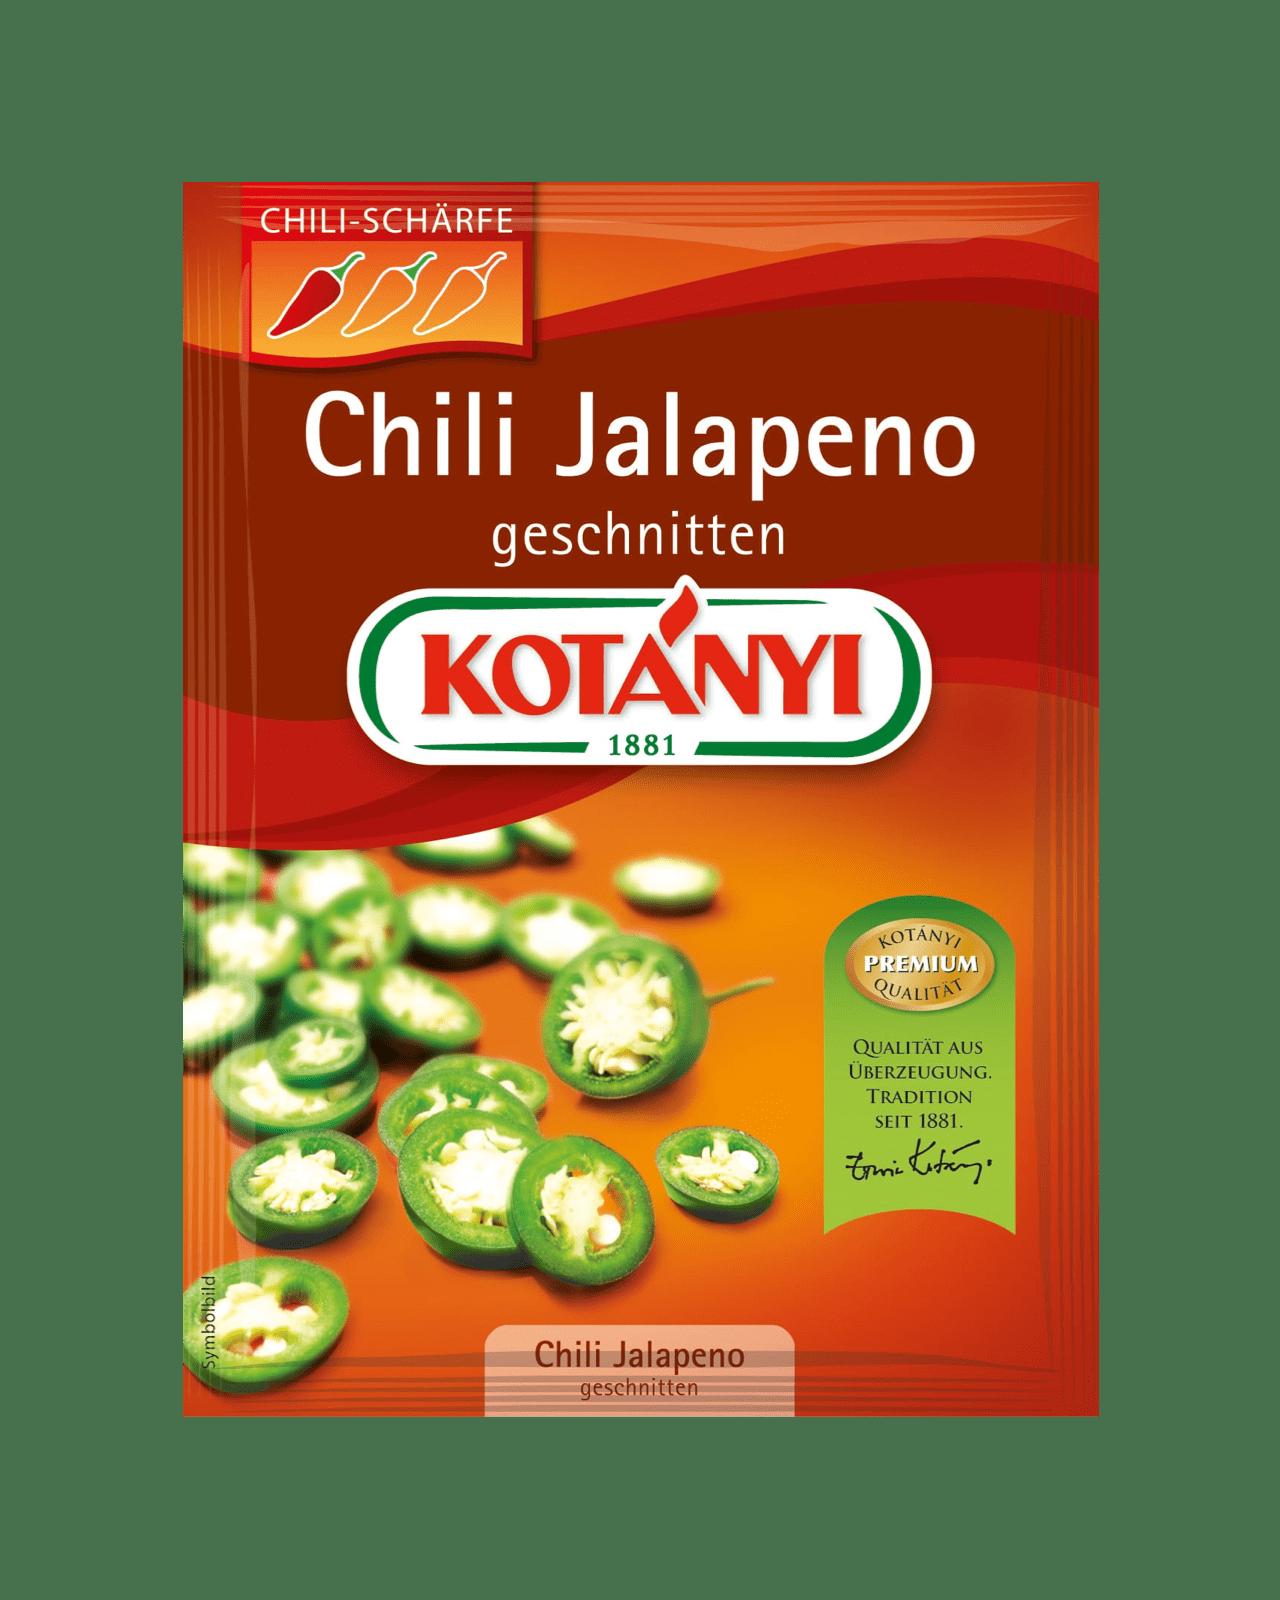 Kotányi Chili Jalapeno geschnitten im Brief